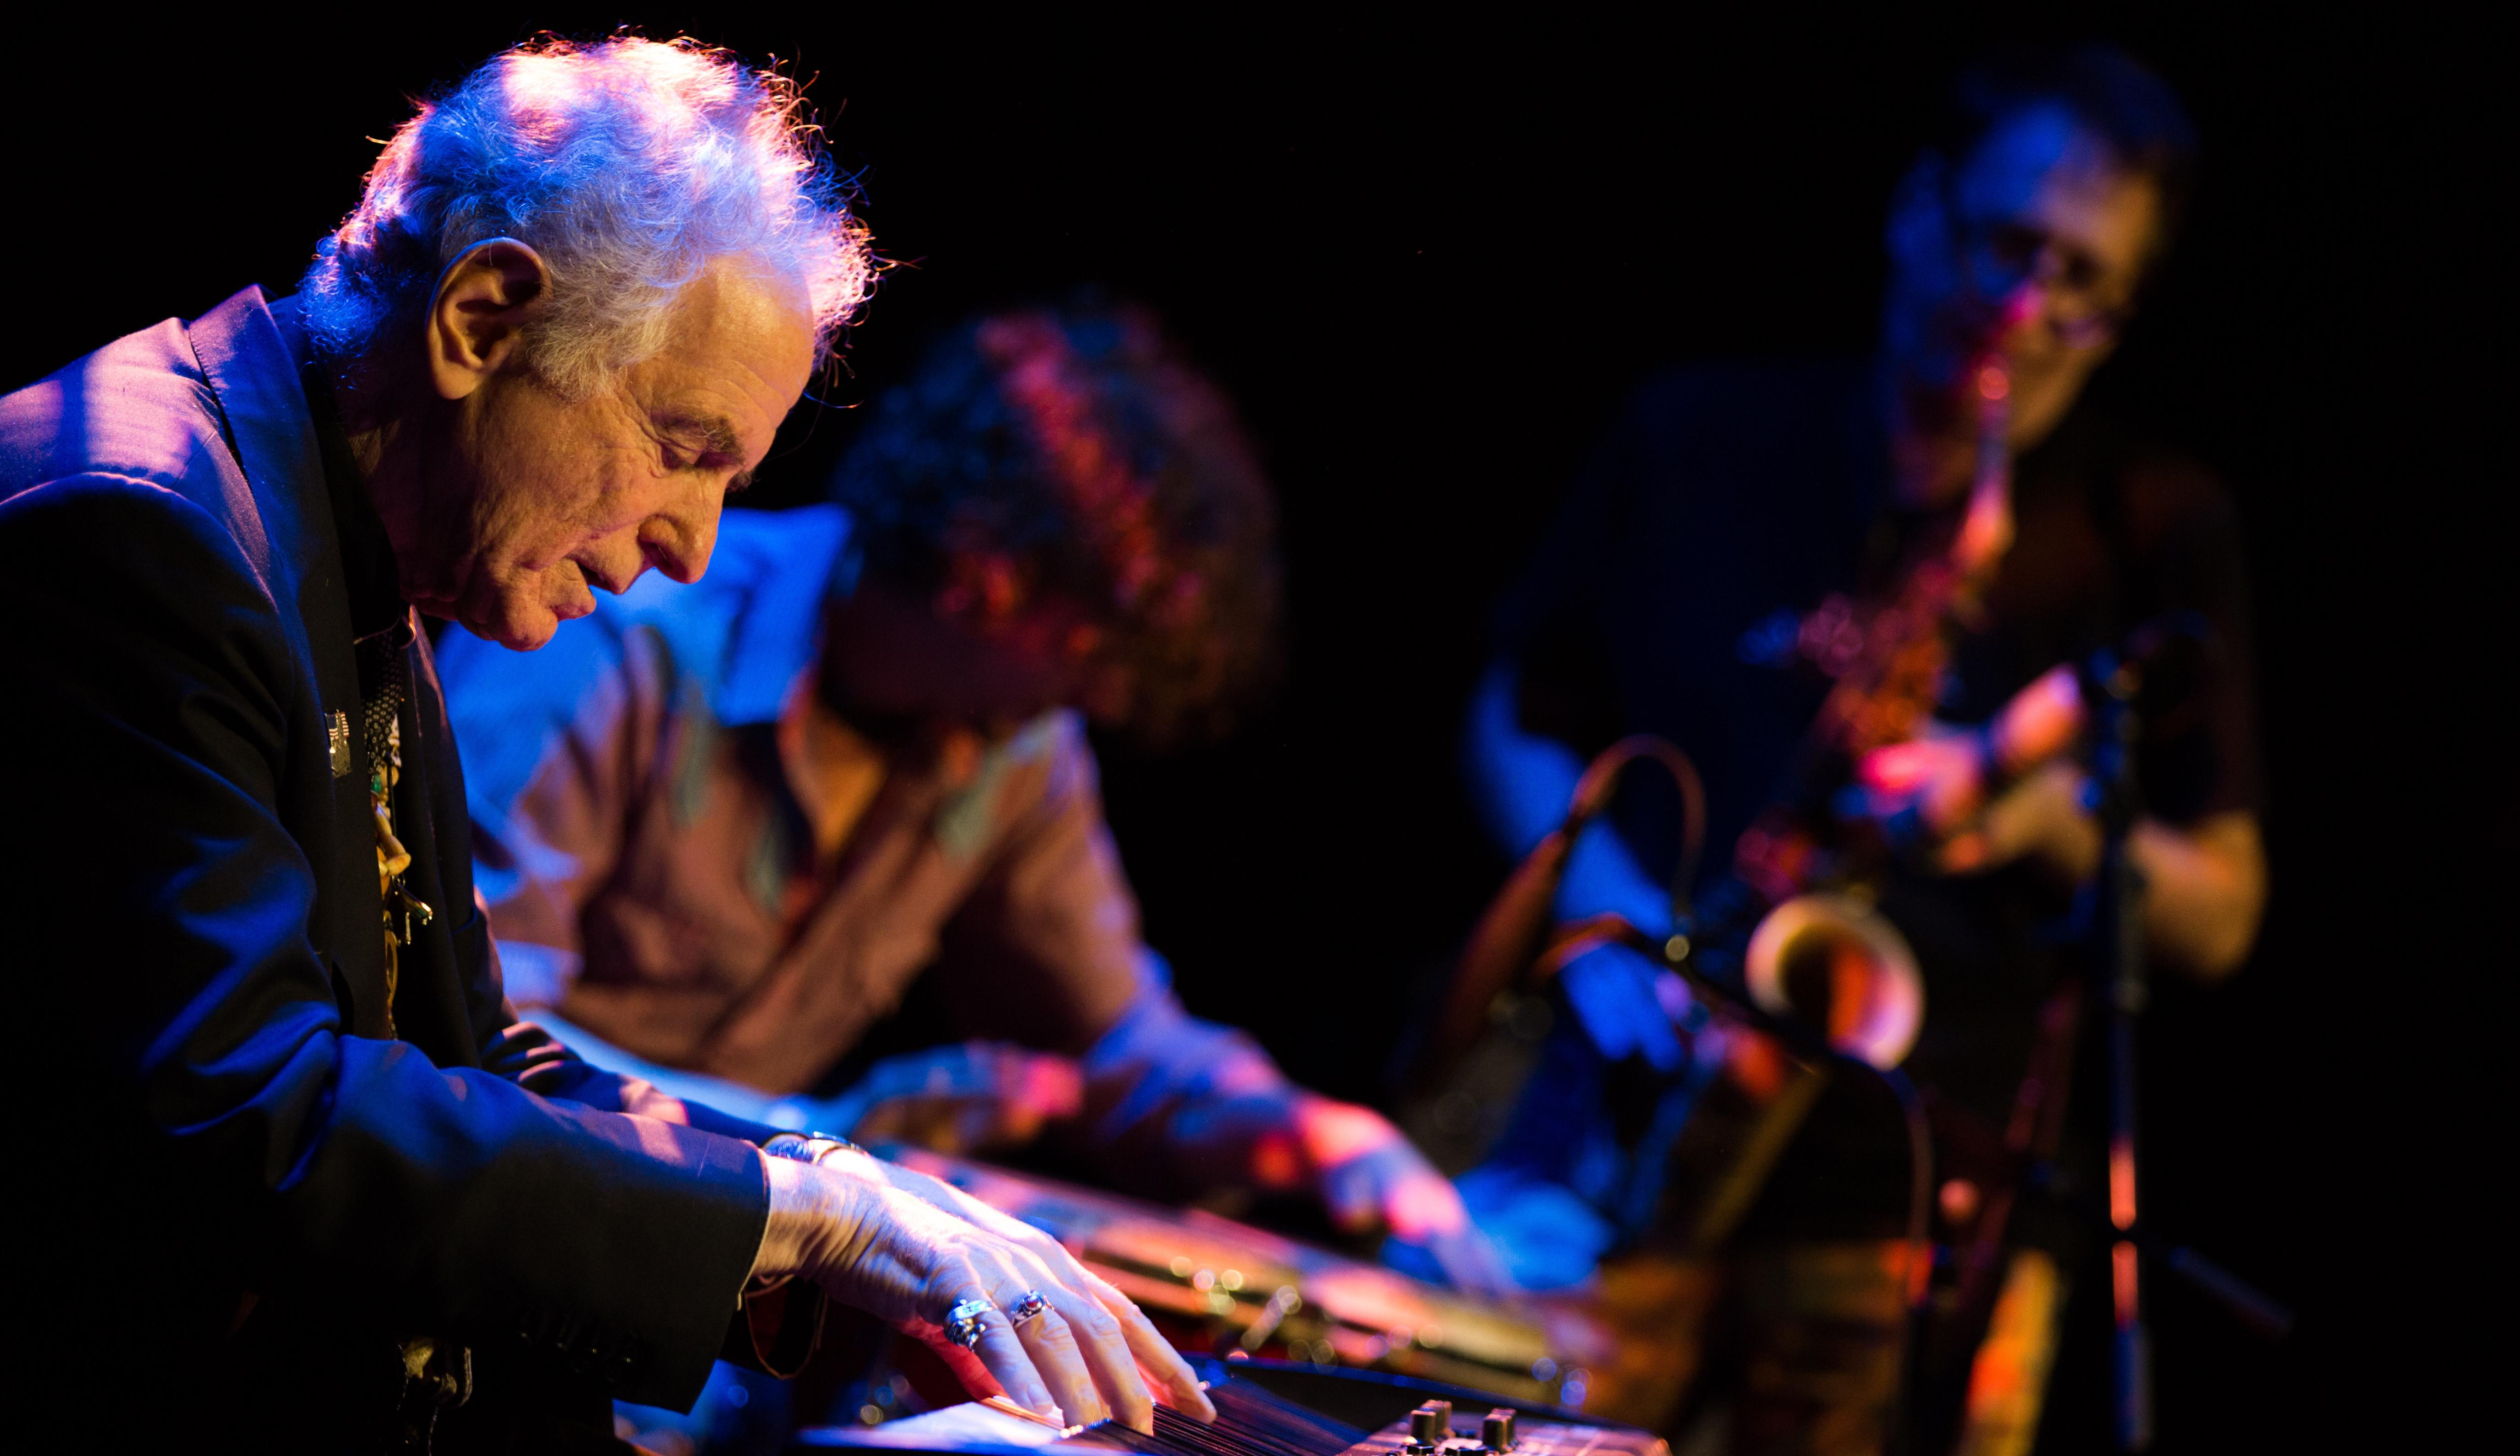 David Amram - Jazz-folk-world music pioneer (2012) 2.2MB